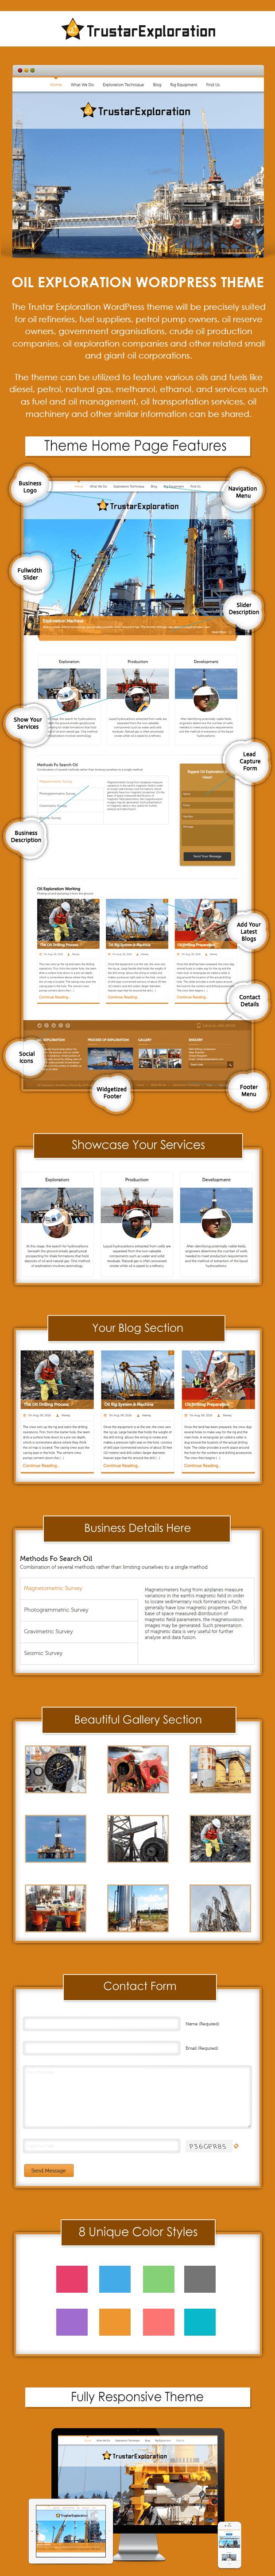 Trustar Exploration WordPress Theme